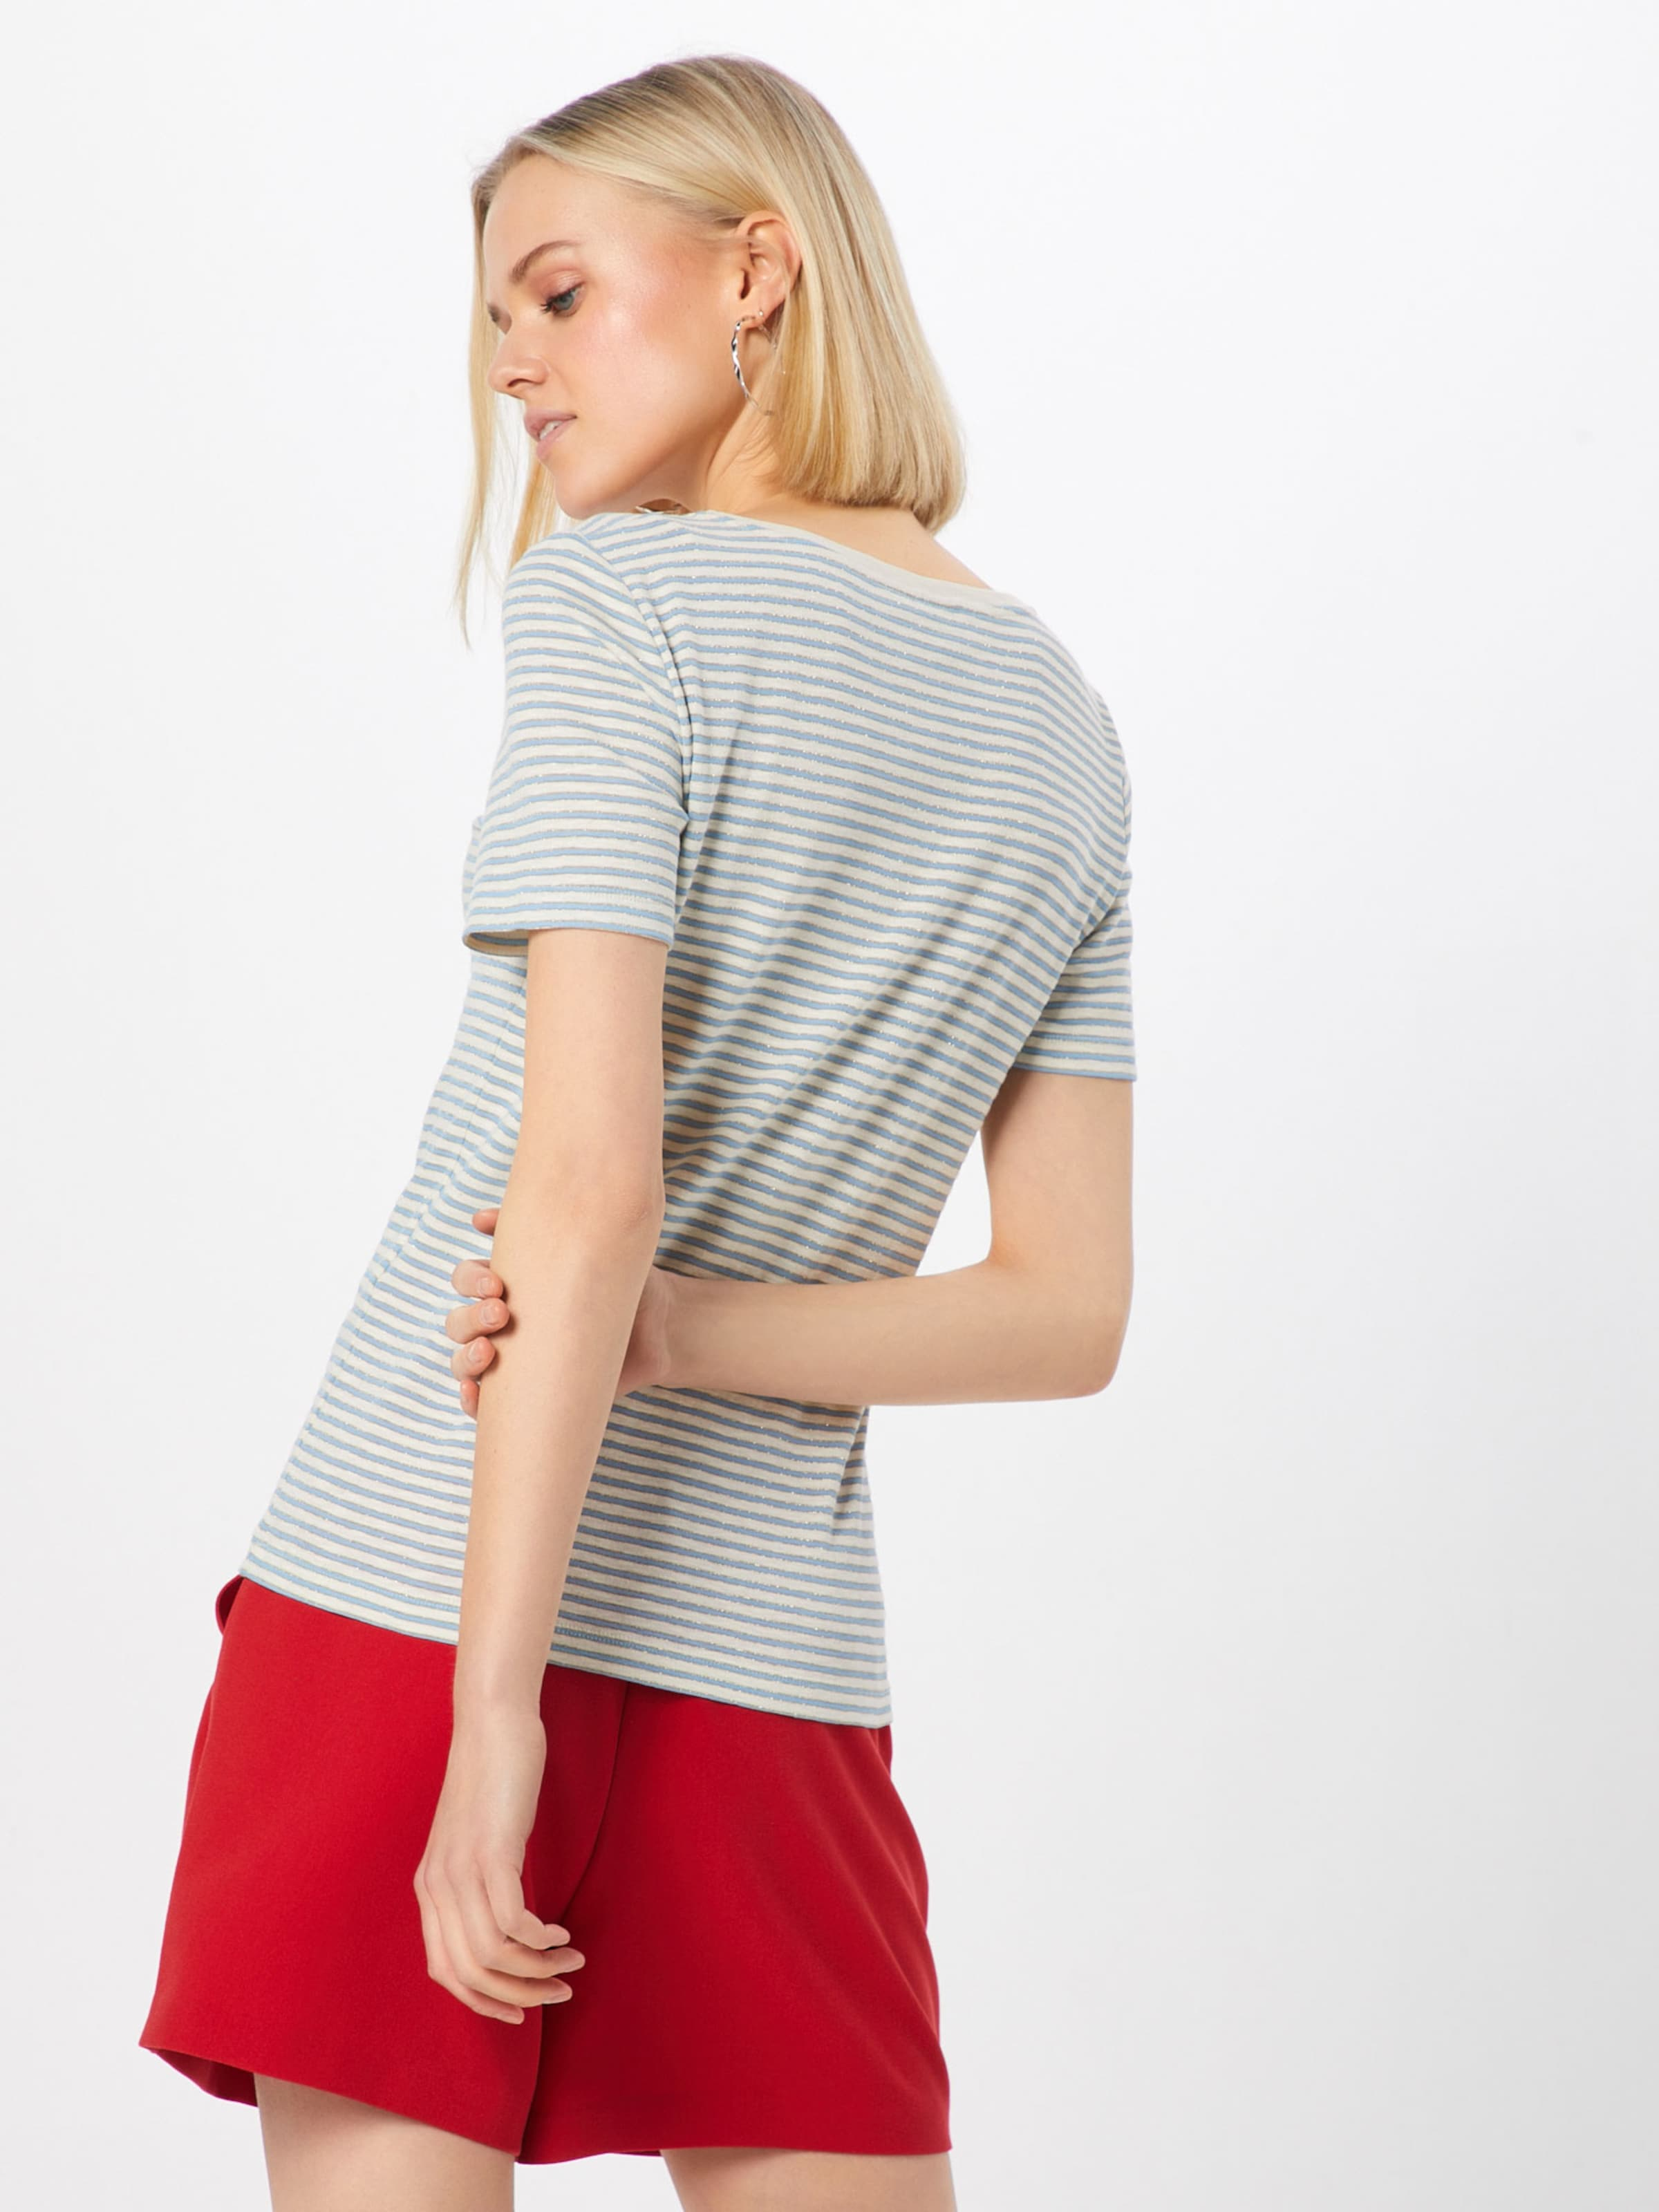 Rouge shirt O En neck' Mosh Stripe T Mos CrèmeBleu 'kenia Clair TKJFl1c